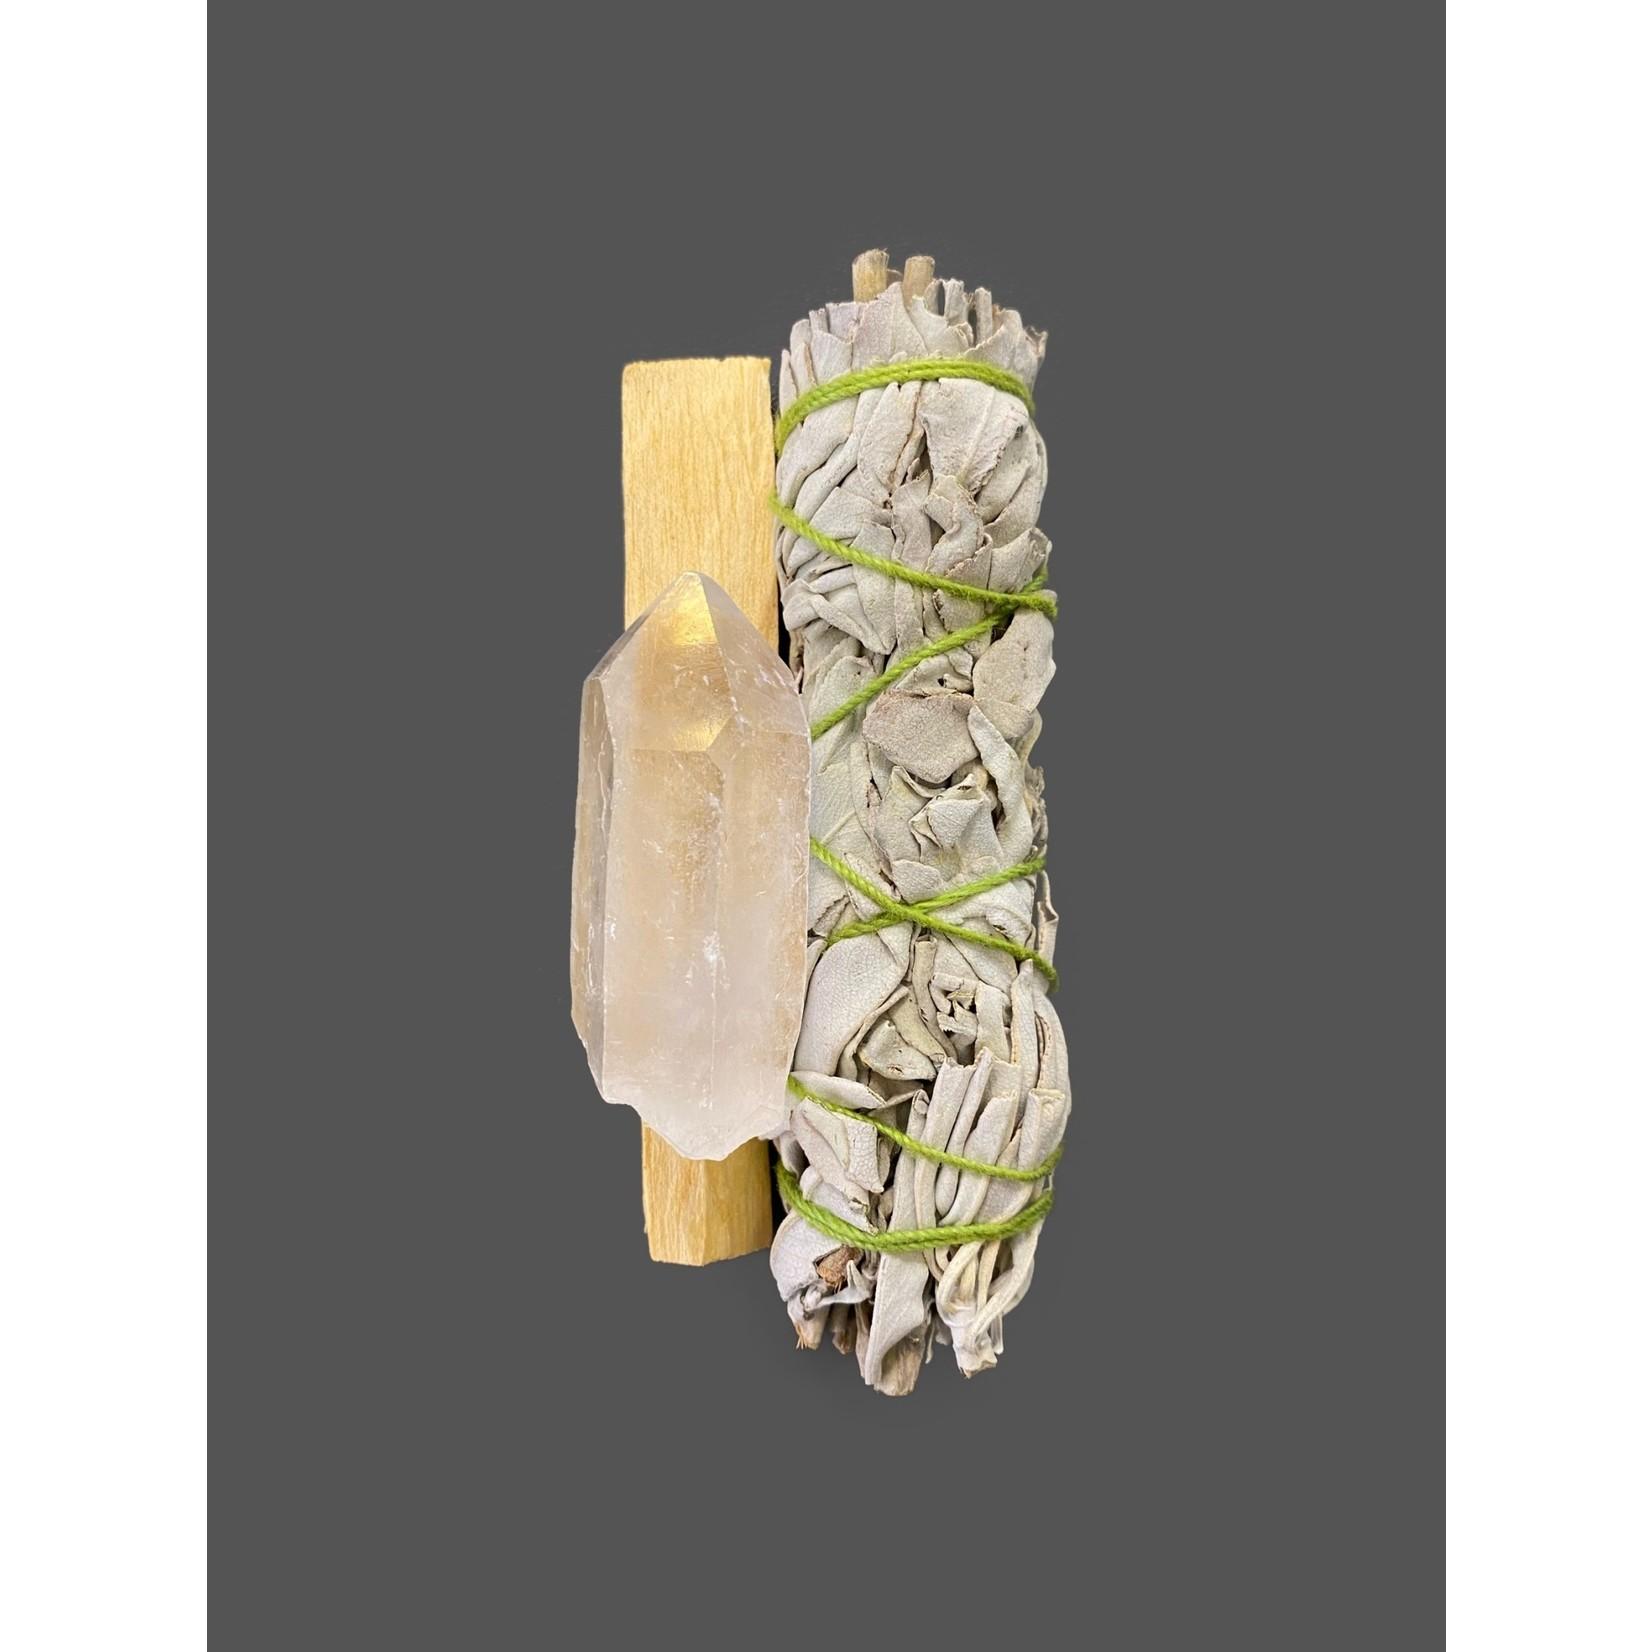 Kit limpieza palo santo-salvia-cuarzo